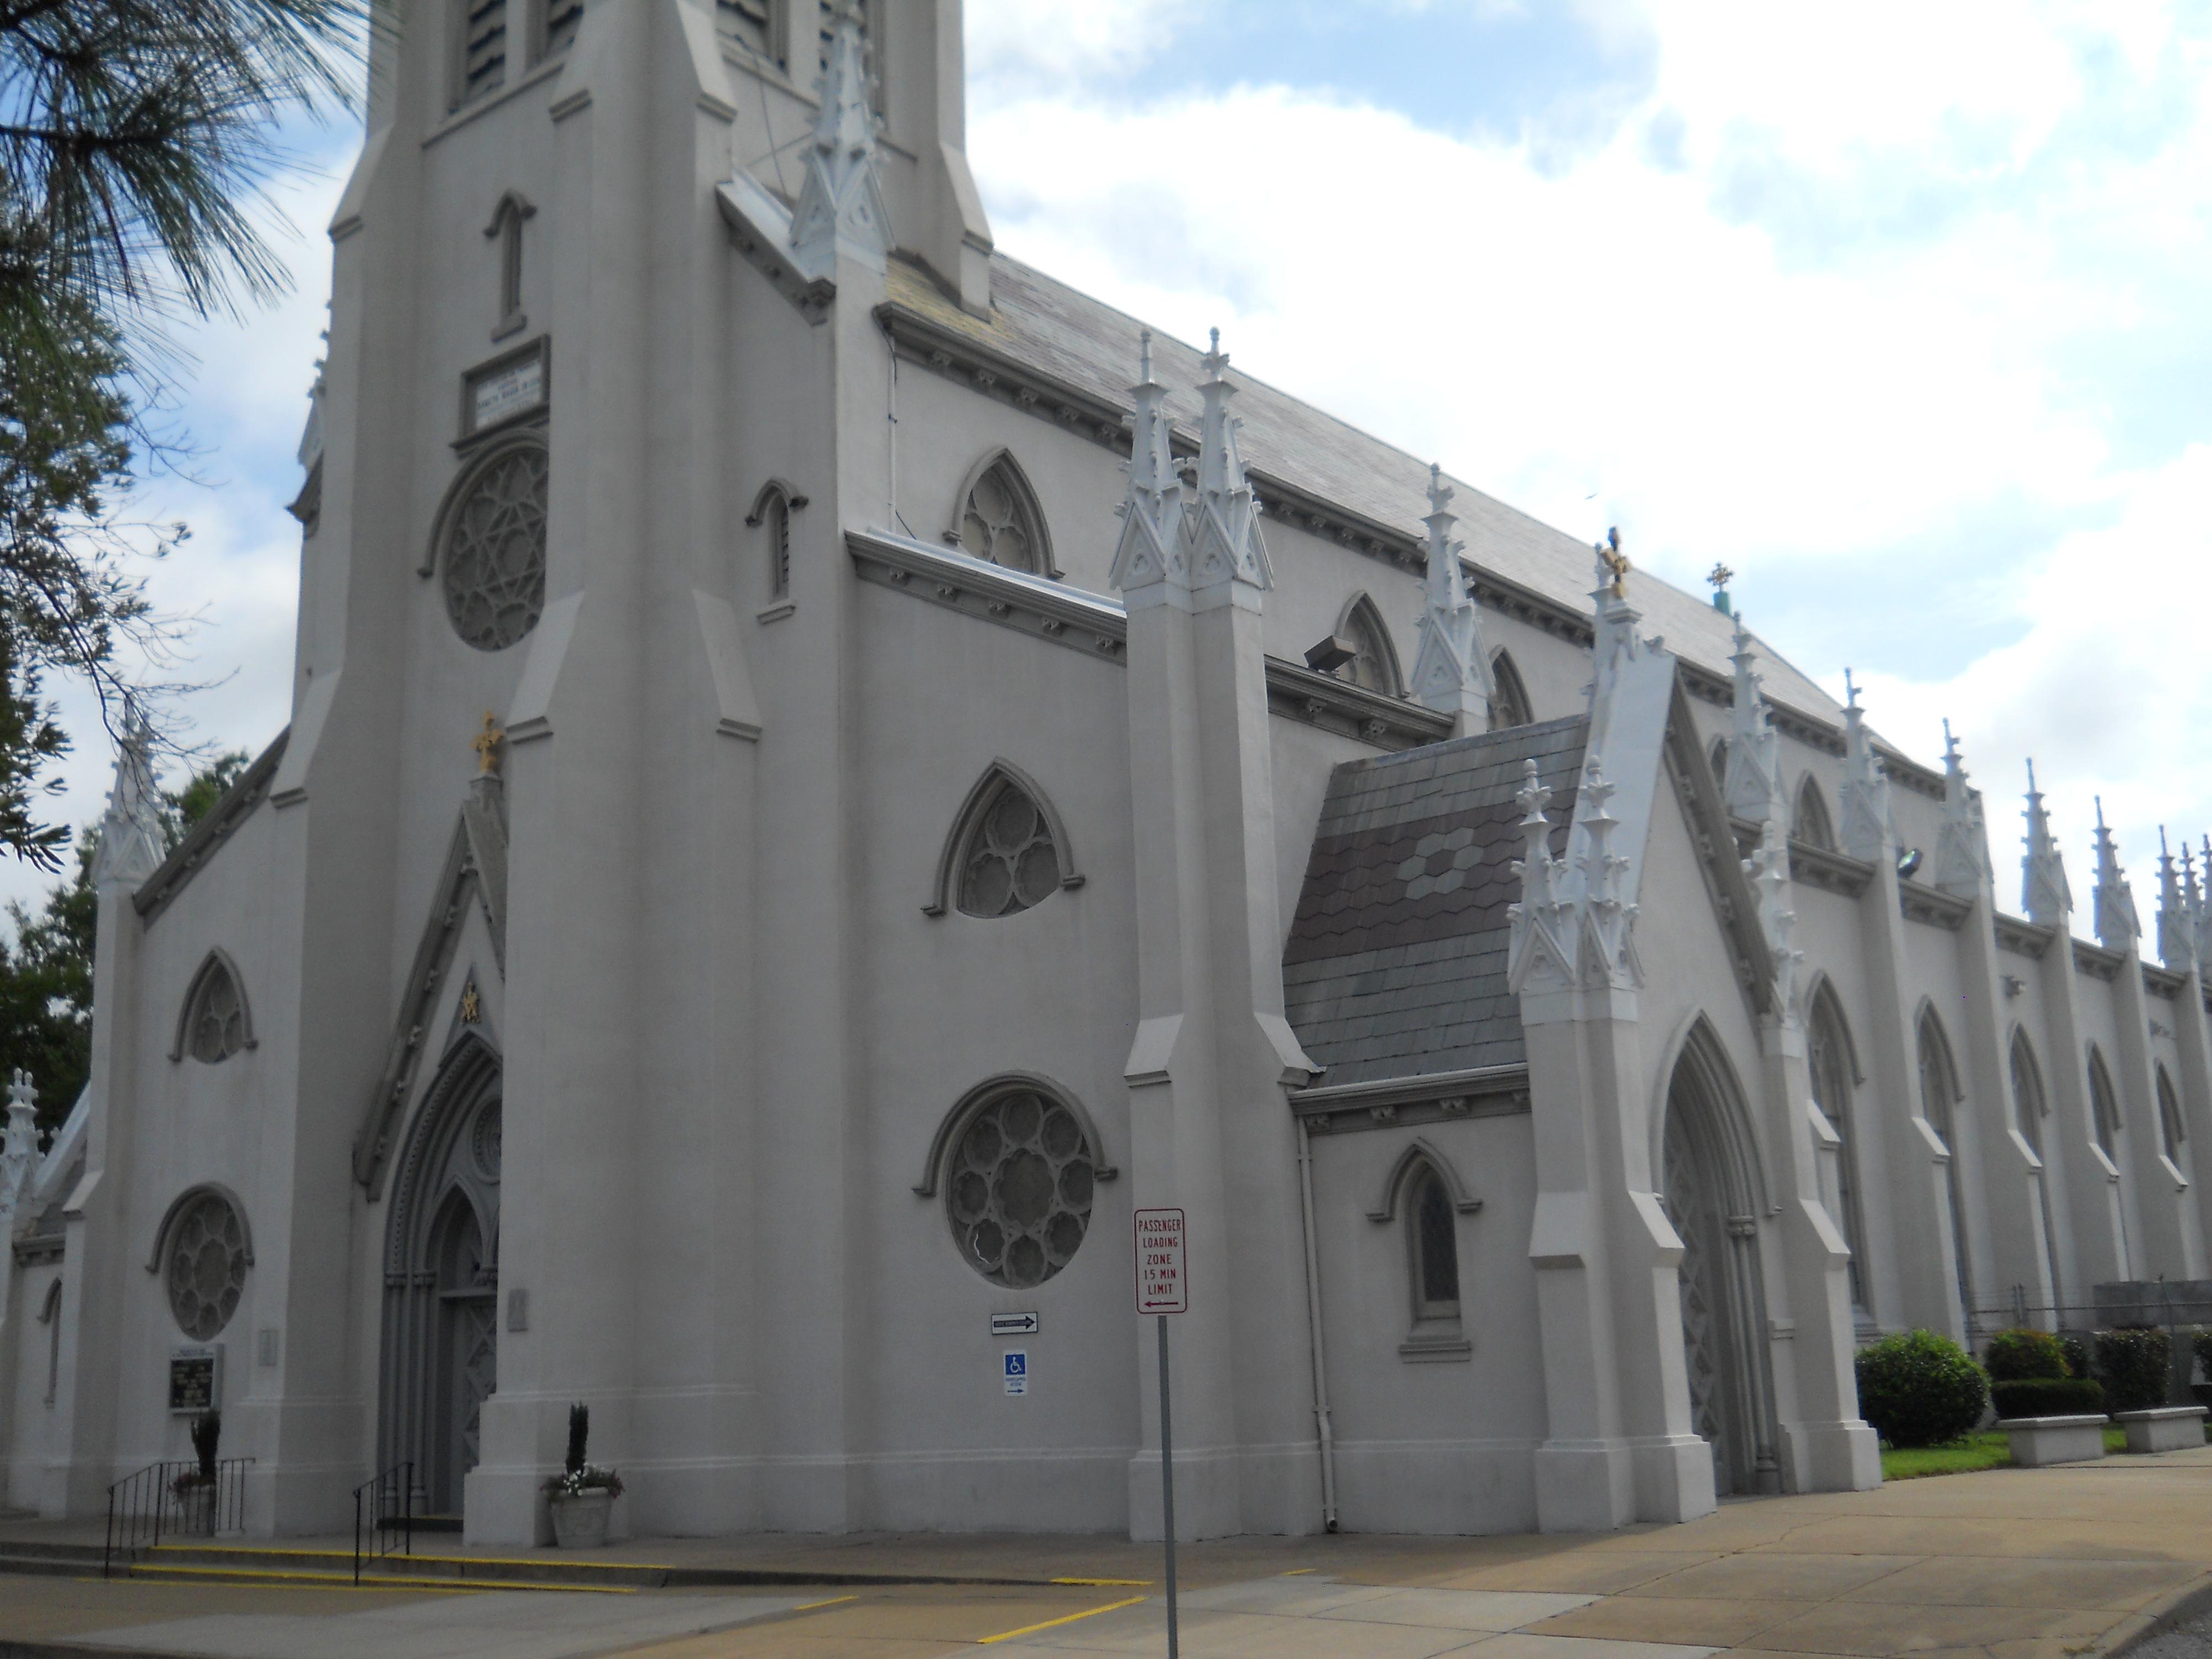 Superb Churches In Norfolk Va #1: St._Mary%27s_Church%2C_Norfolk%2C_VA.JPG